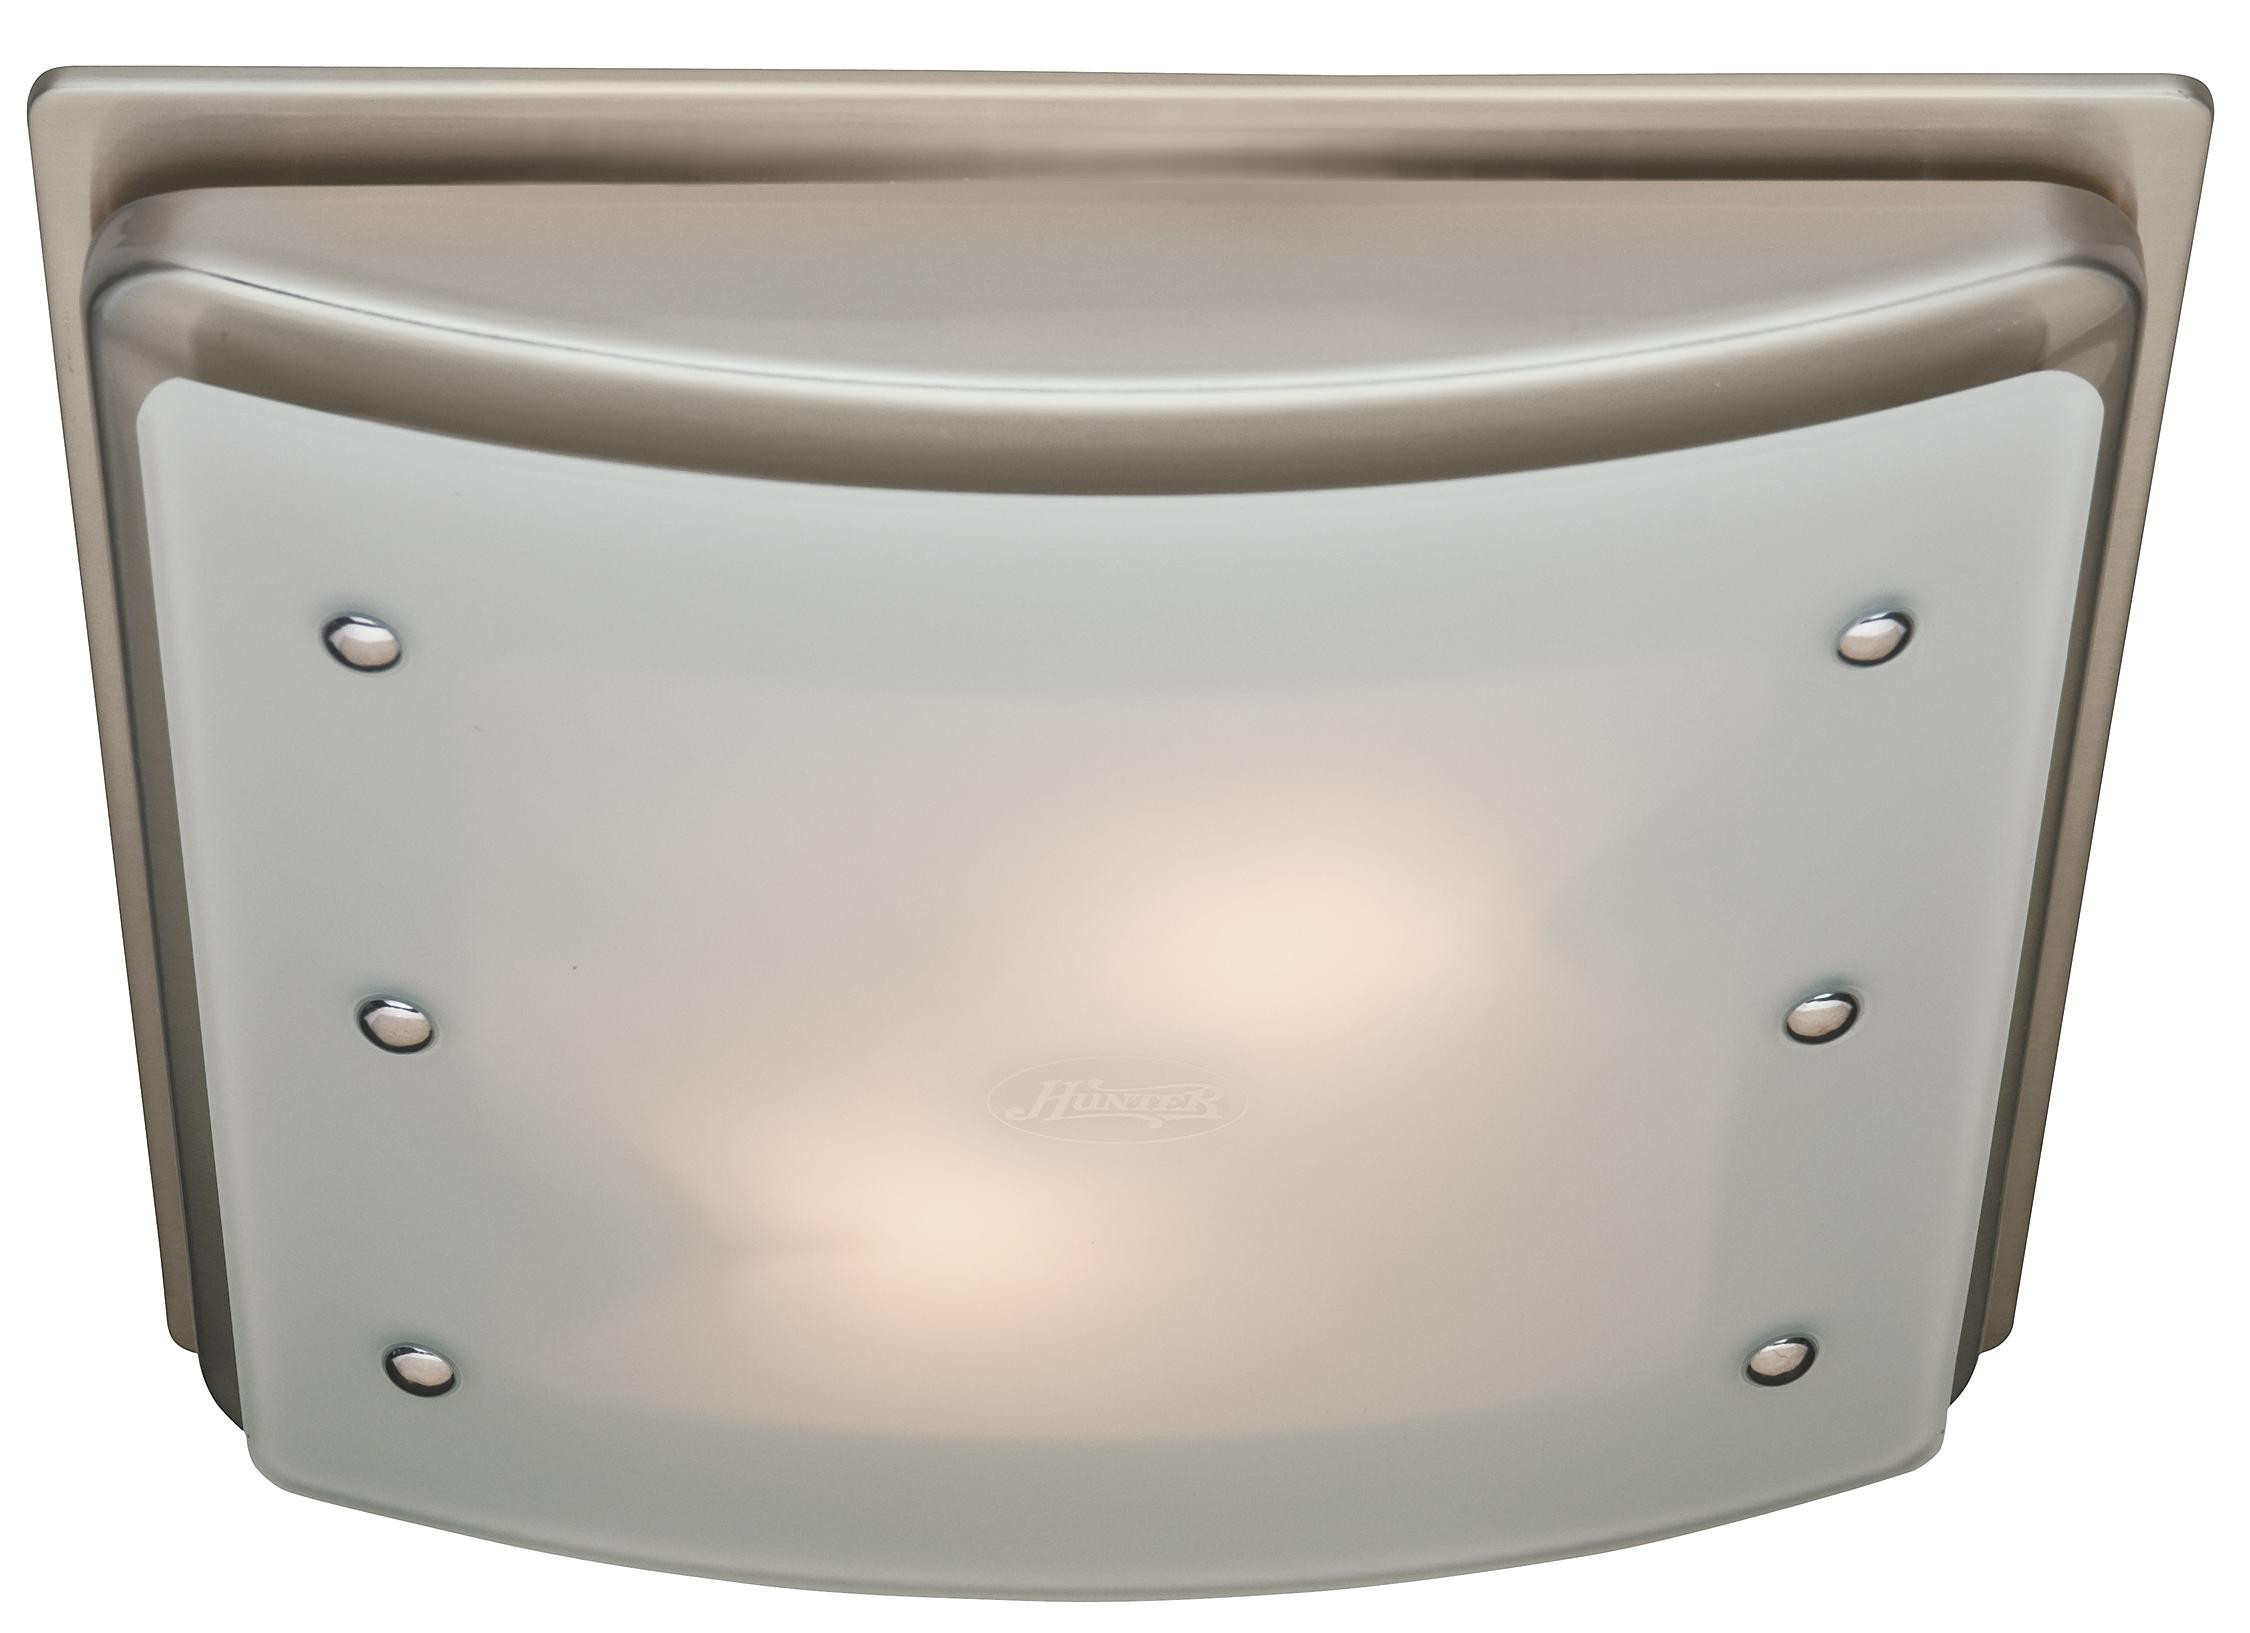 Bathroom Vent And Light  Hunter Ellipse Bathroom Ventilation Exhaust Fan with